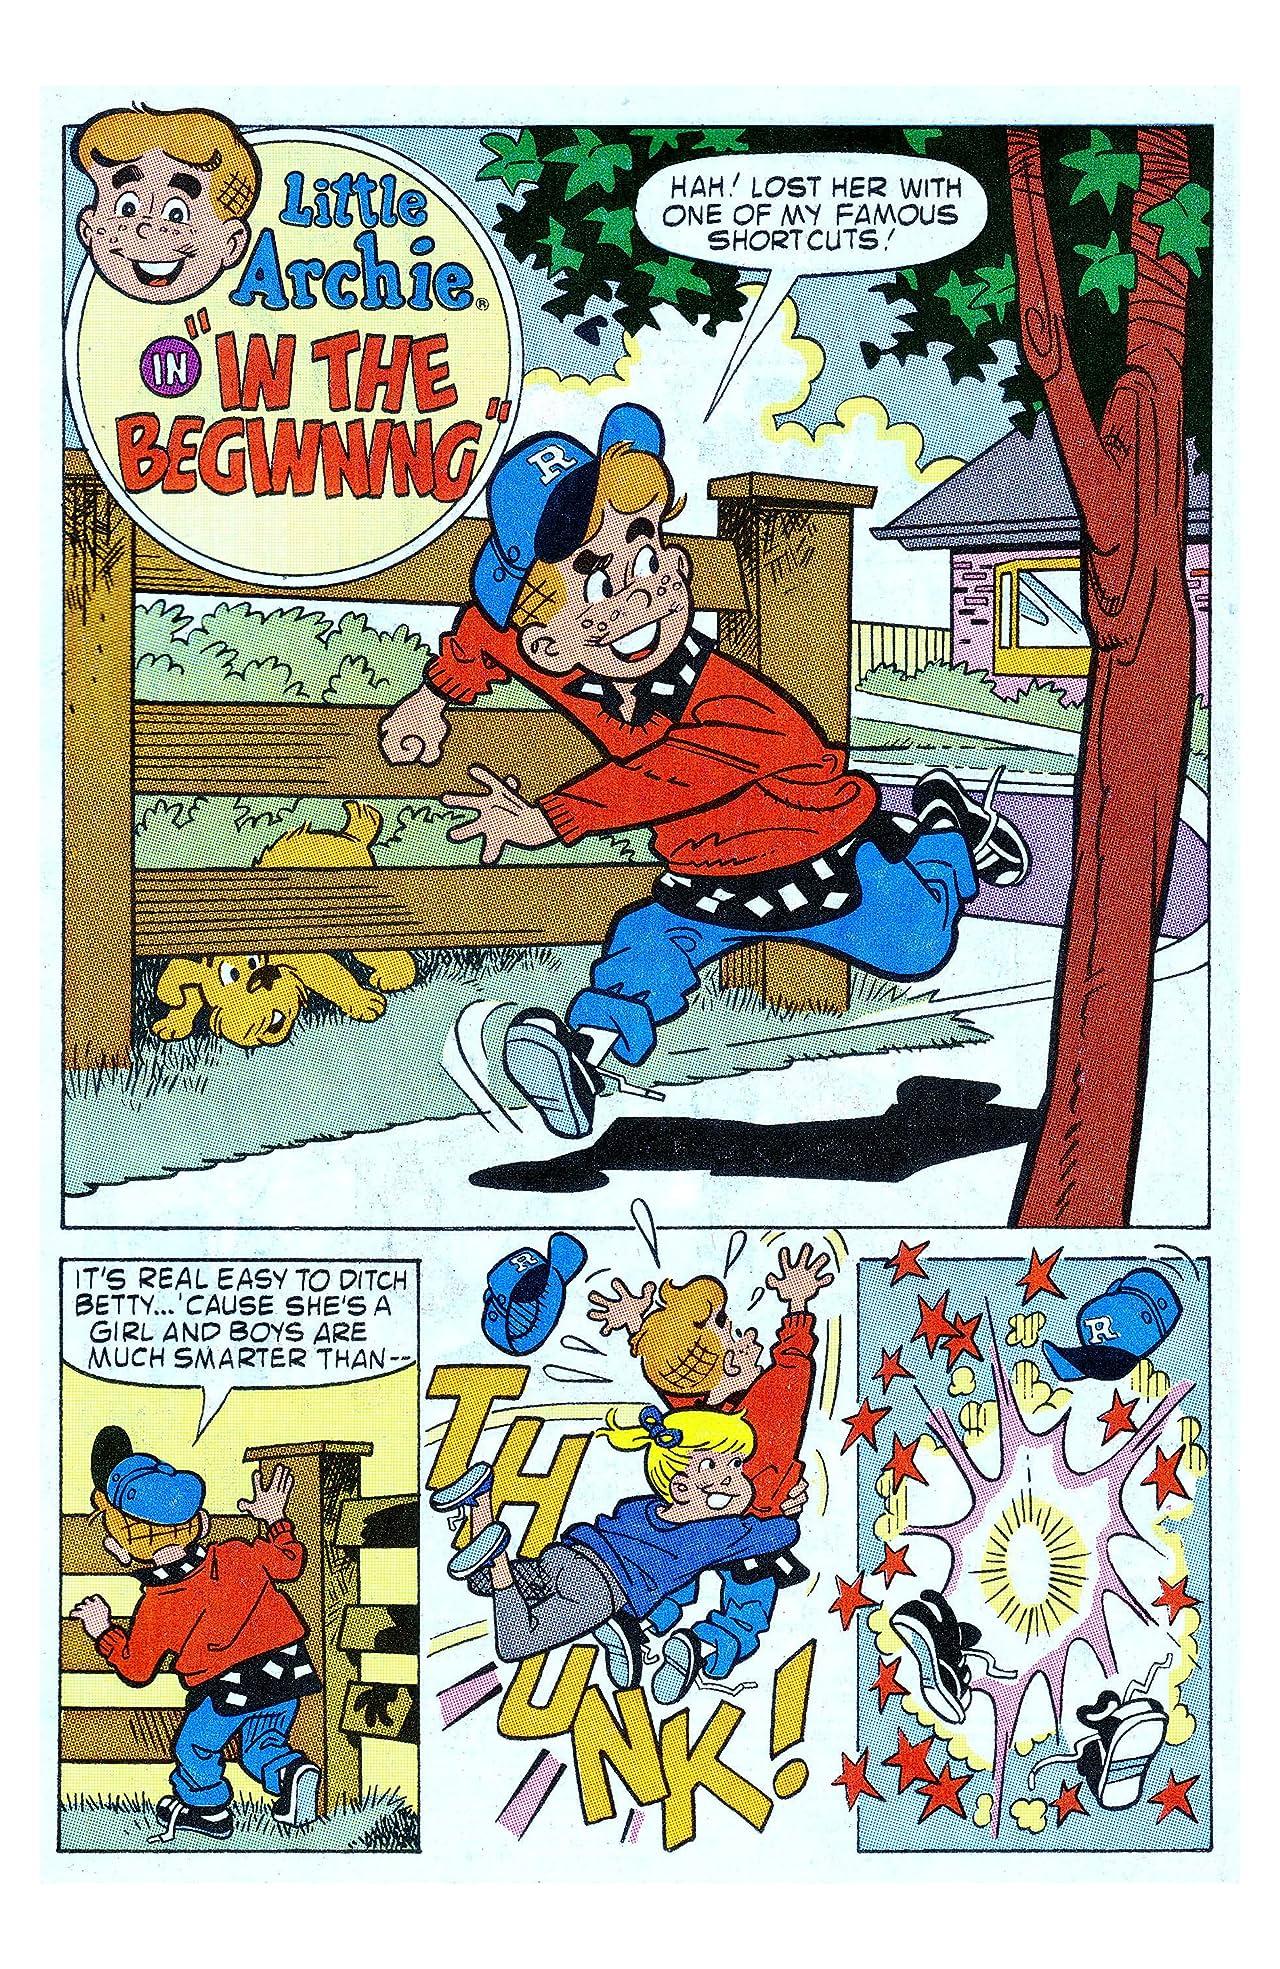 Archie #400